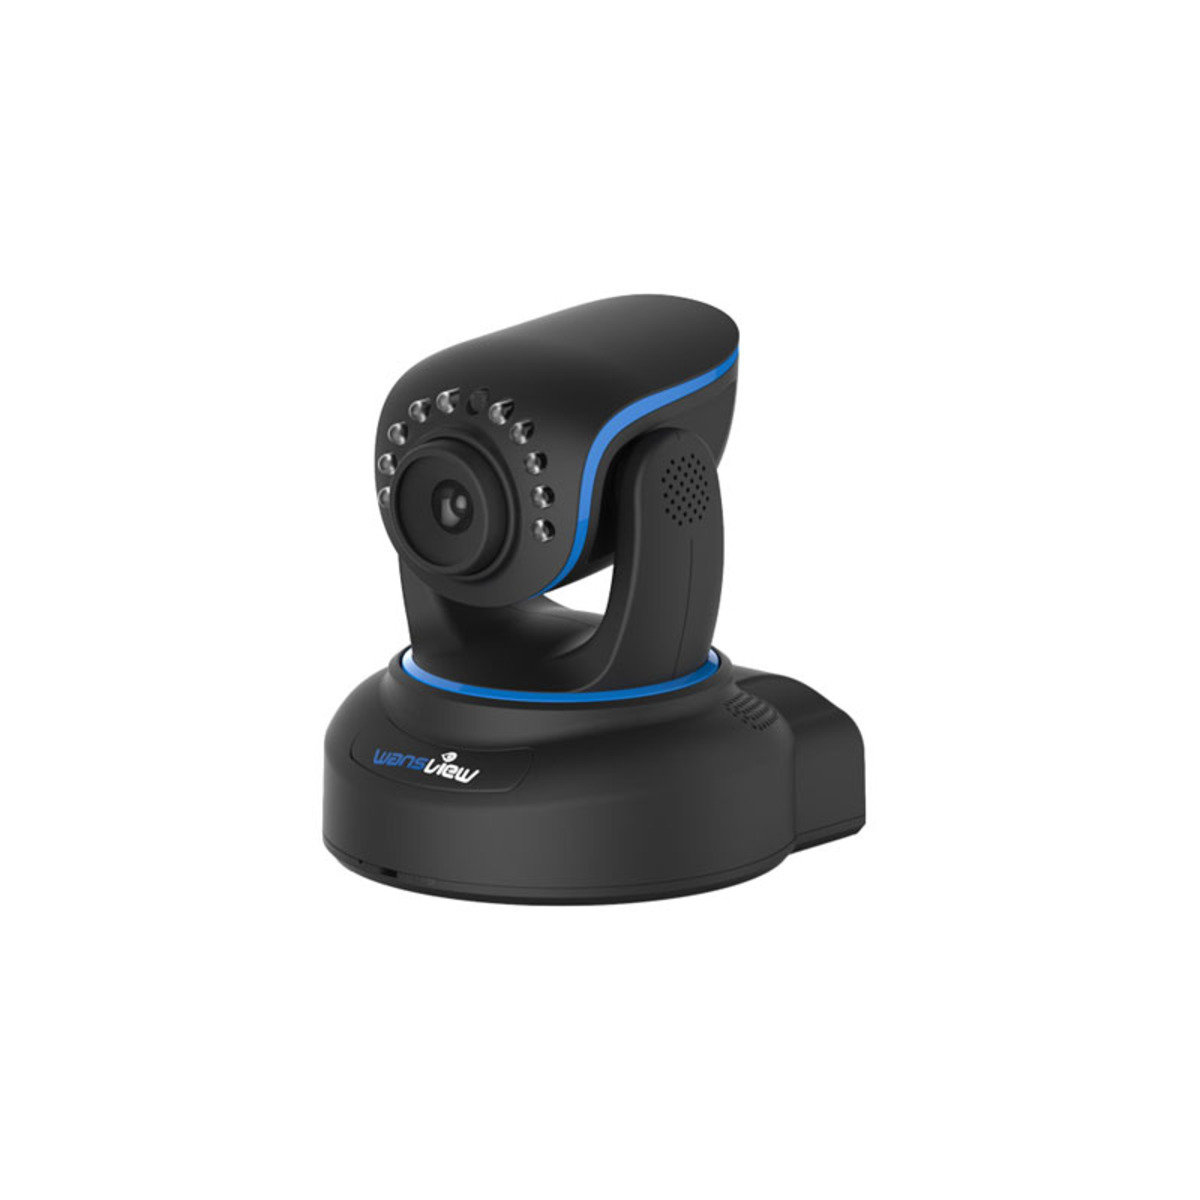 1080p 全高清旋轉式多角度無線網路攝影機 NCM625GA